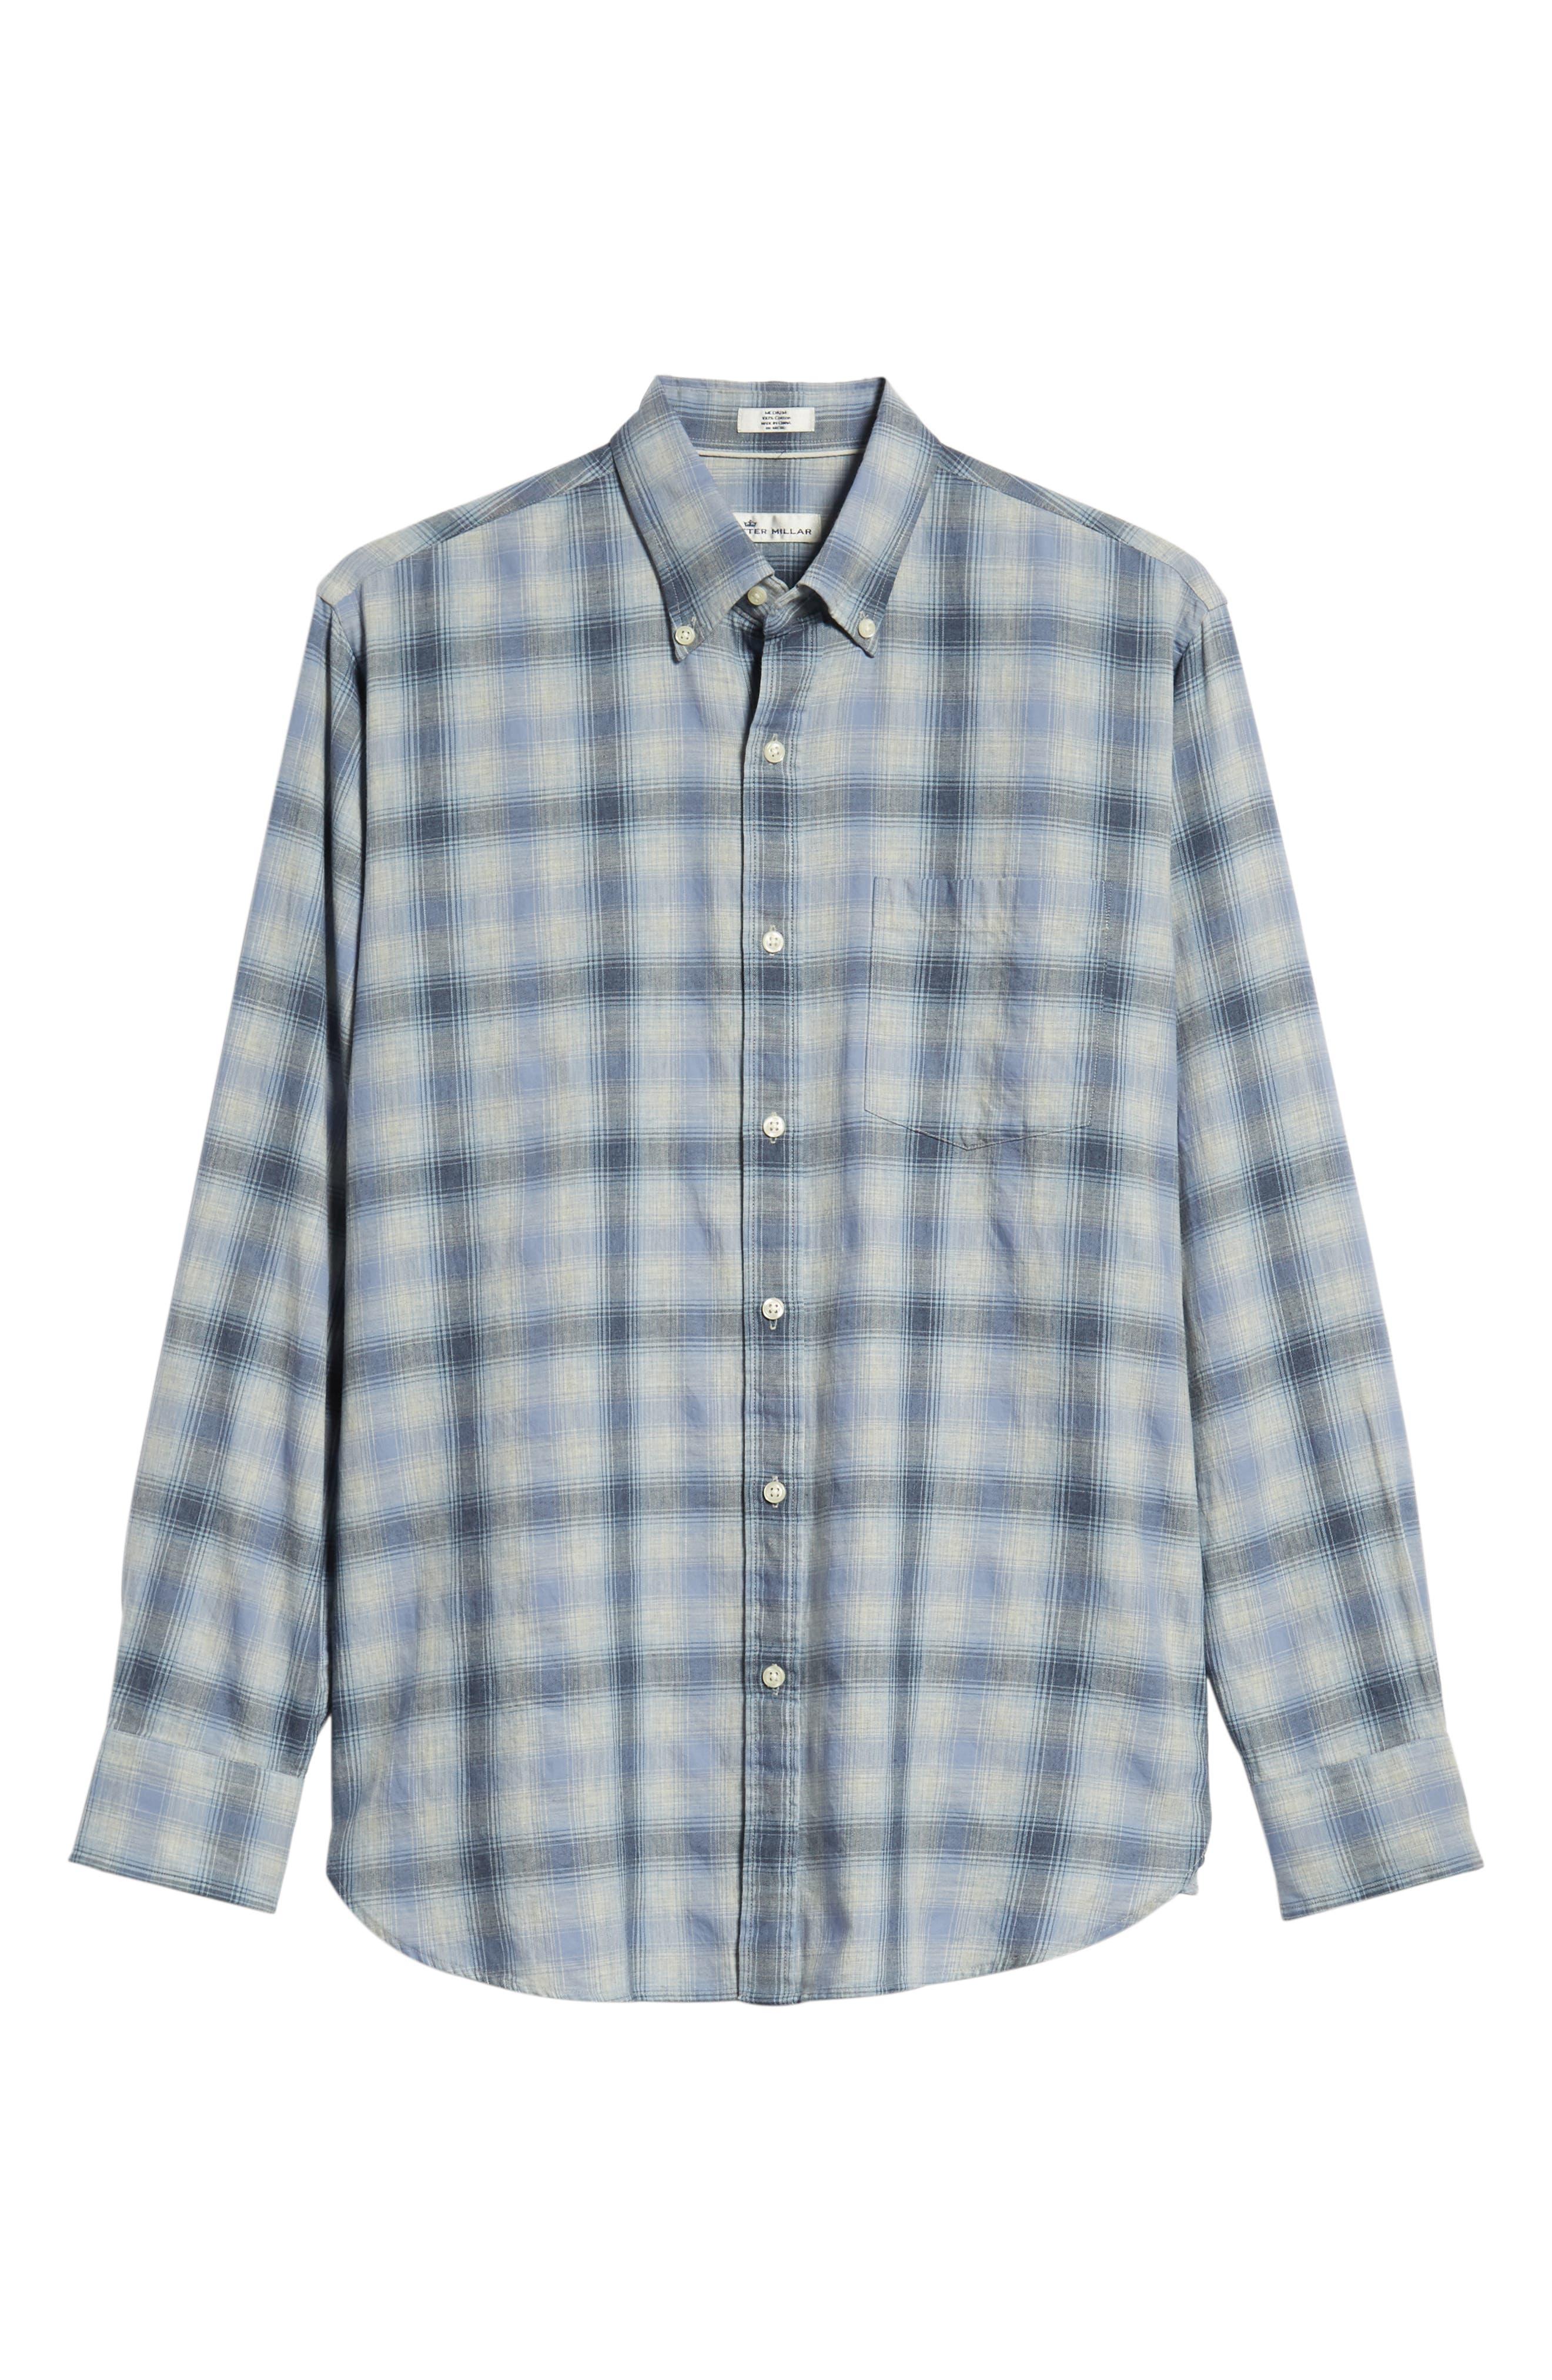 Mountain Fog Plaid Sport Shirt,                             Alternate thumbnail 5, color,                             ATLANTIC BLUE